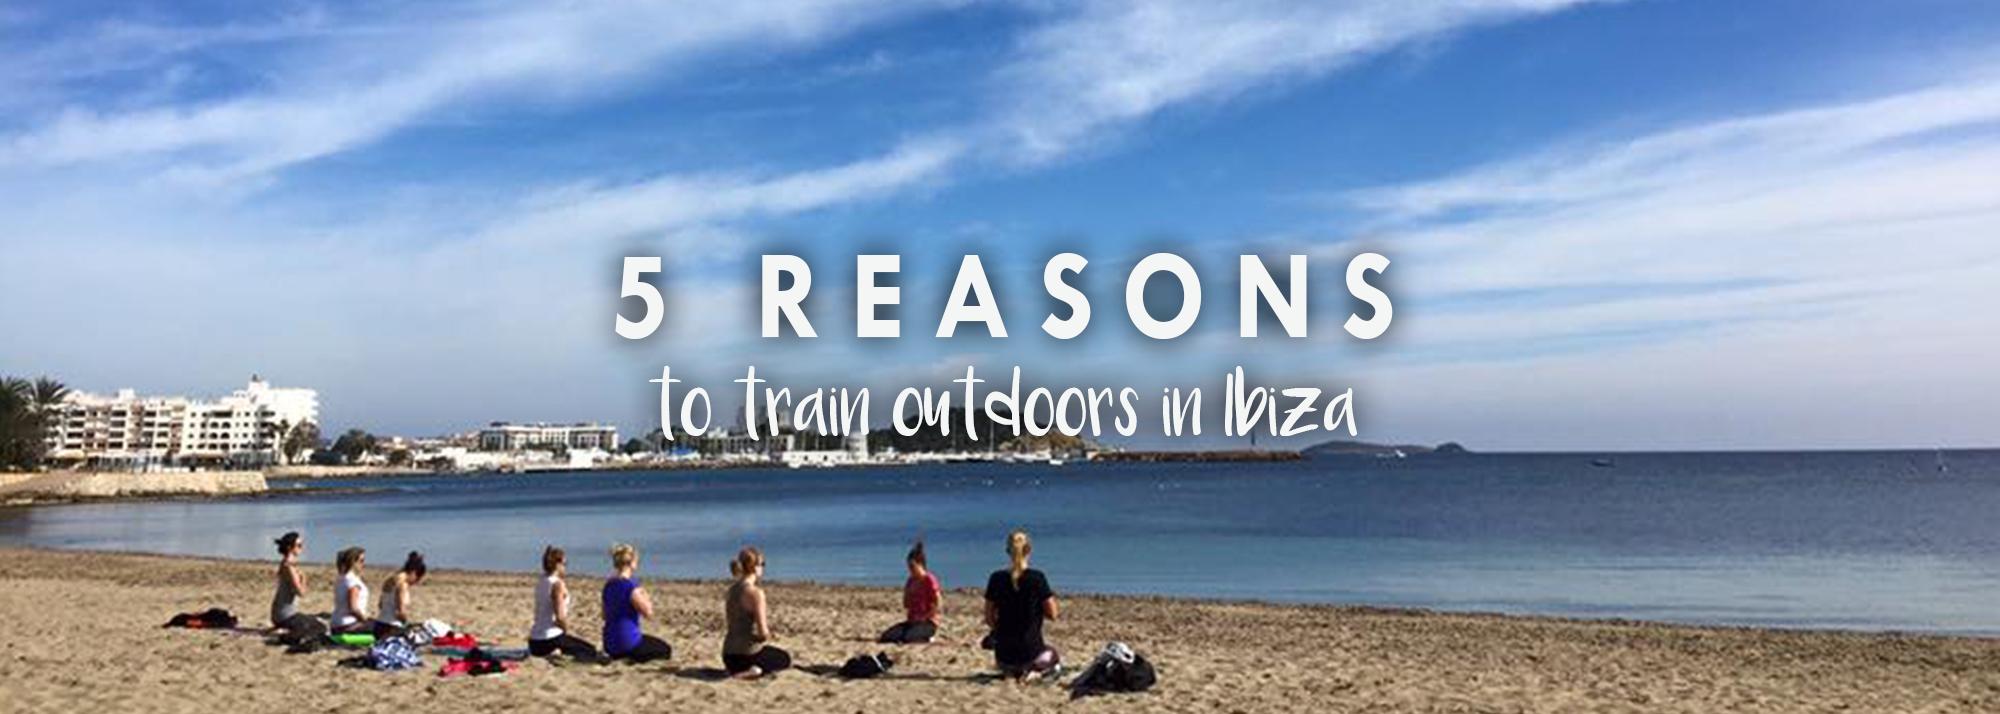 5 Reasons To Train Outdoors In Ibiza